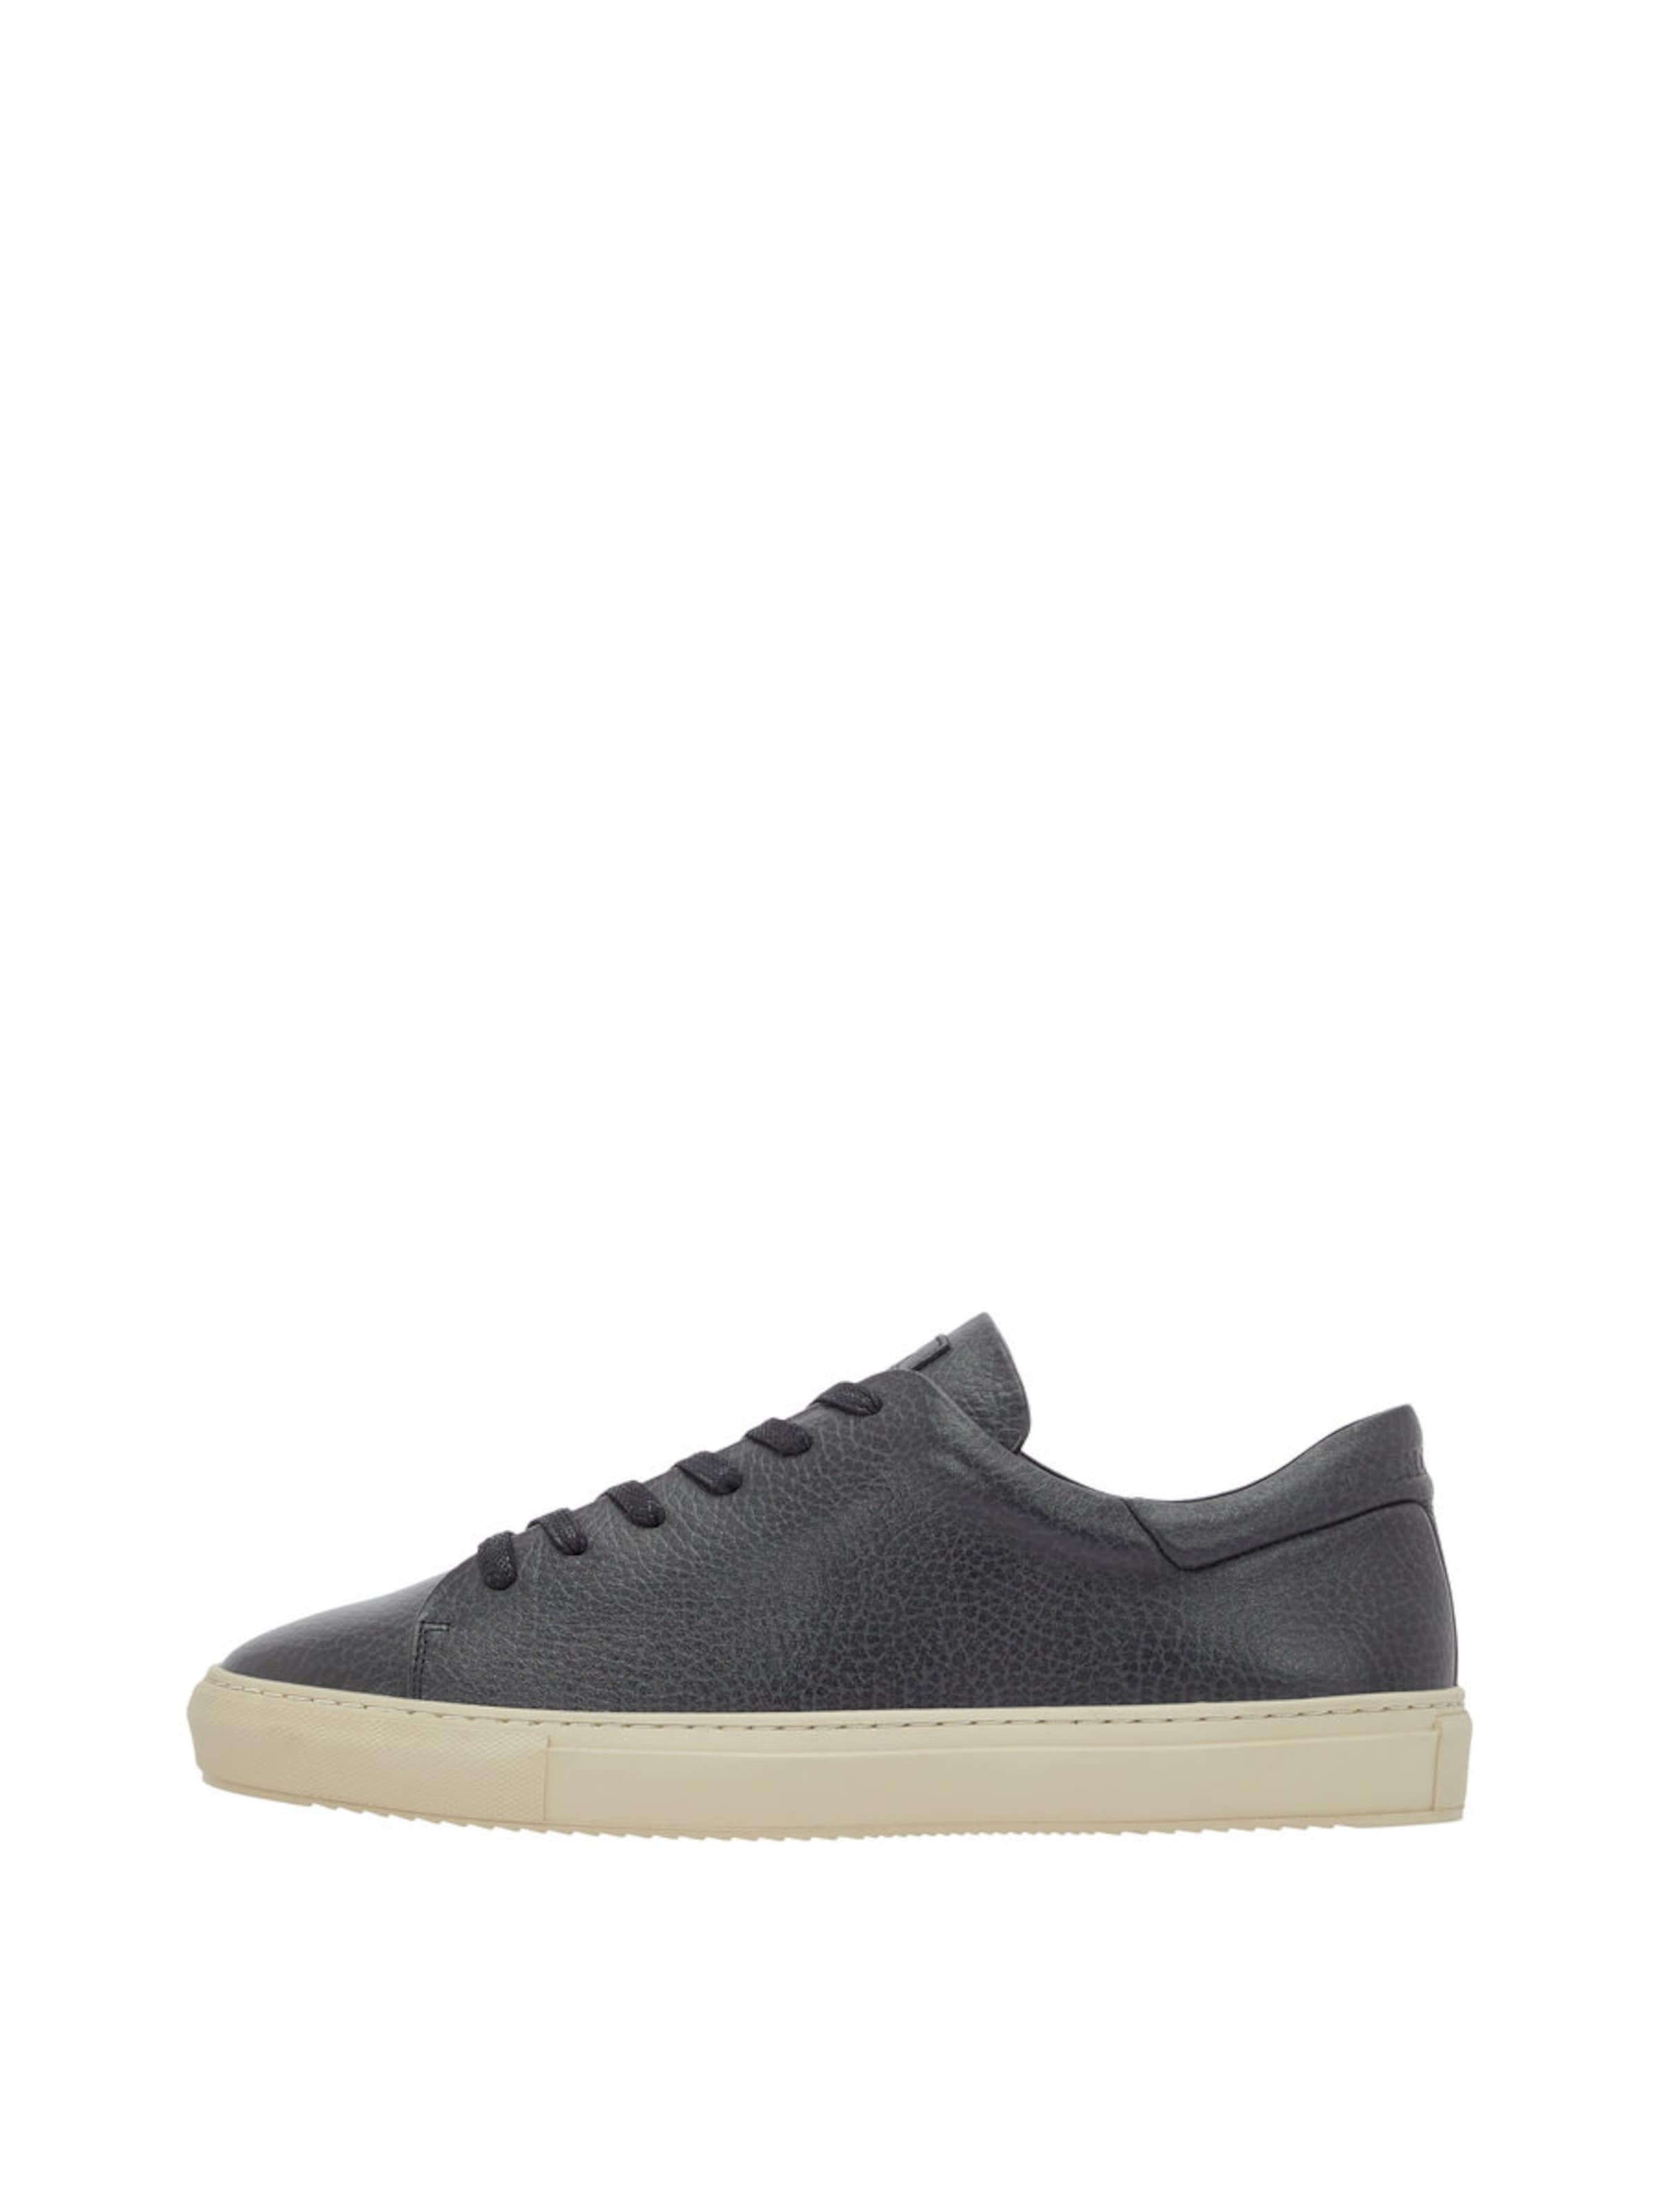 J.Lindeberg Lot Leather Grain Sneaker Sneaker Grain 1372d9